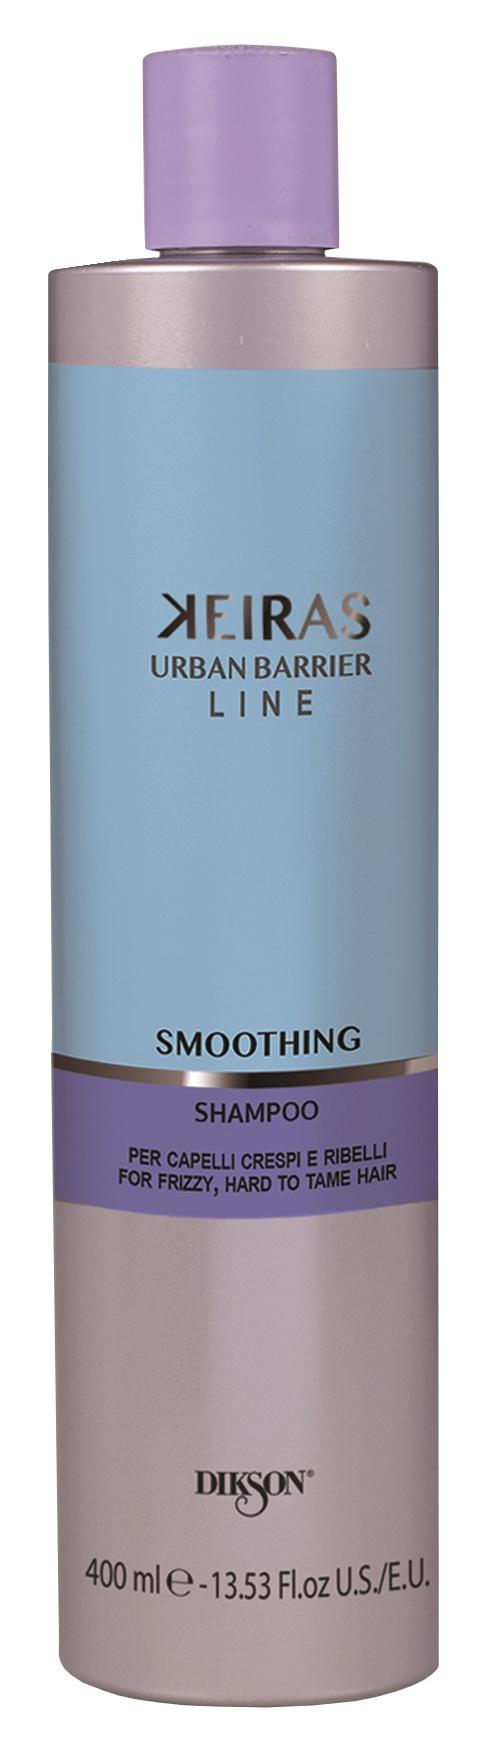 Купить DIKSON Шампунь для непослушных волос / KEIRAS SHAMPOO FOR FRIZZY, HARD TO TAME HAIR 400 мл